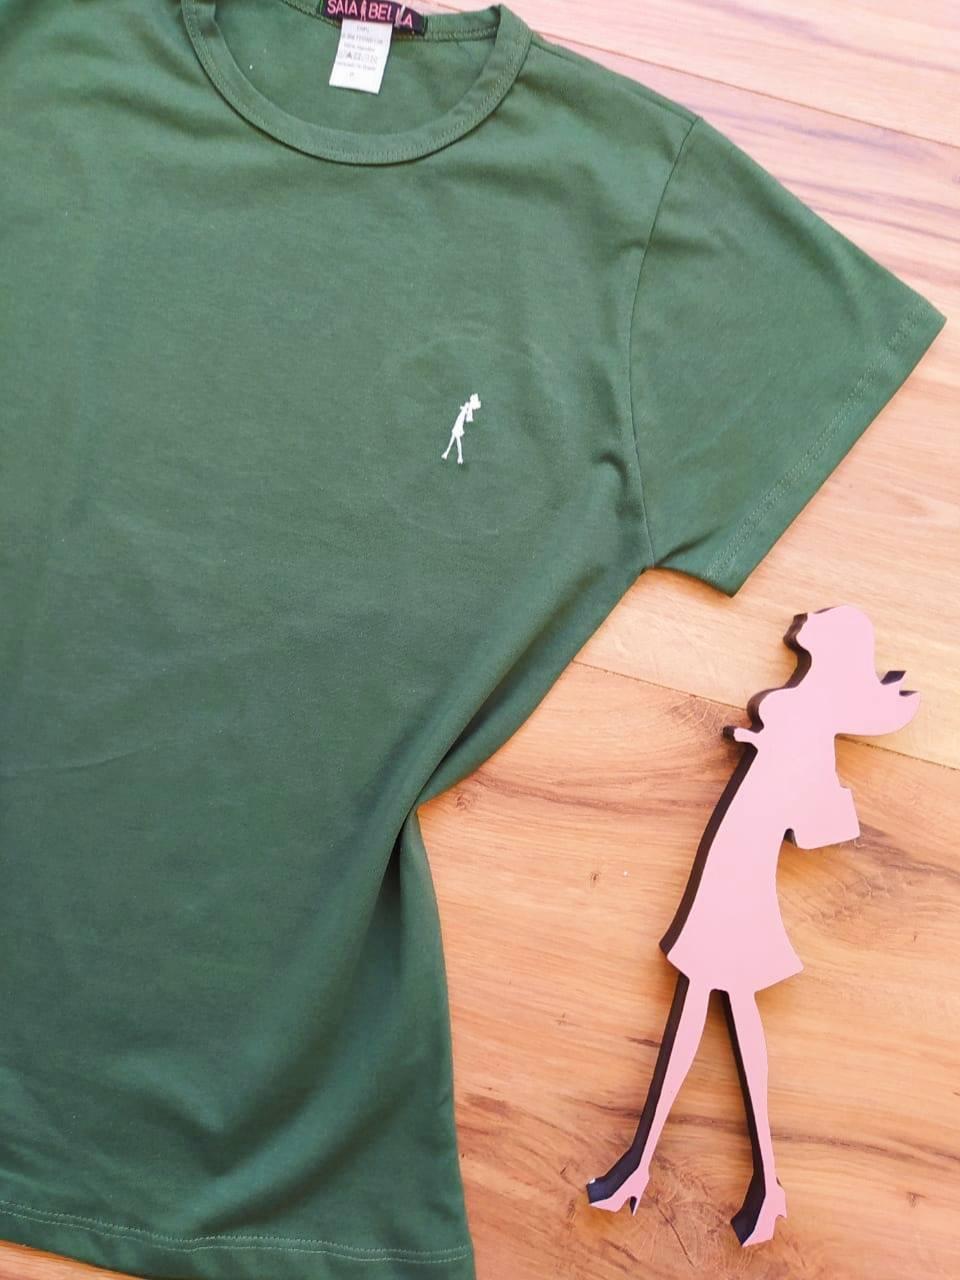 T-shirt Ana Maria Saia Bella Lisa SB90001 Verde